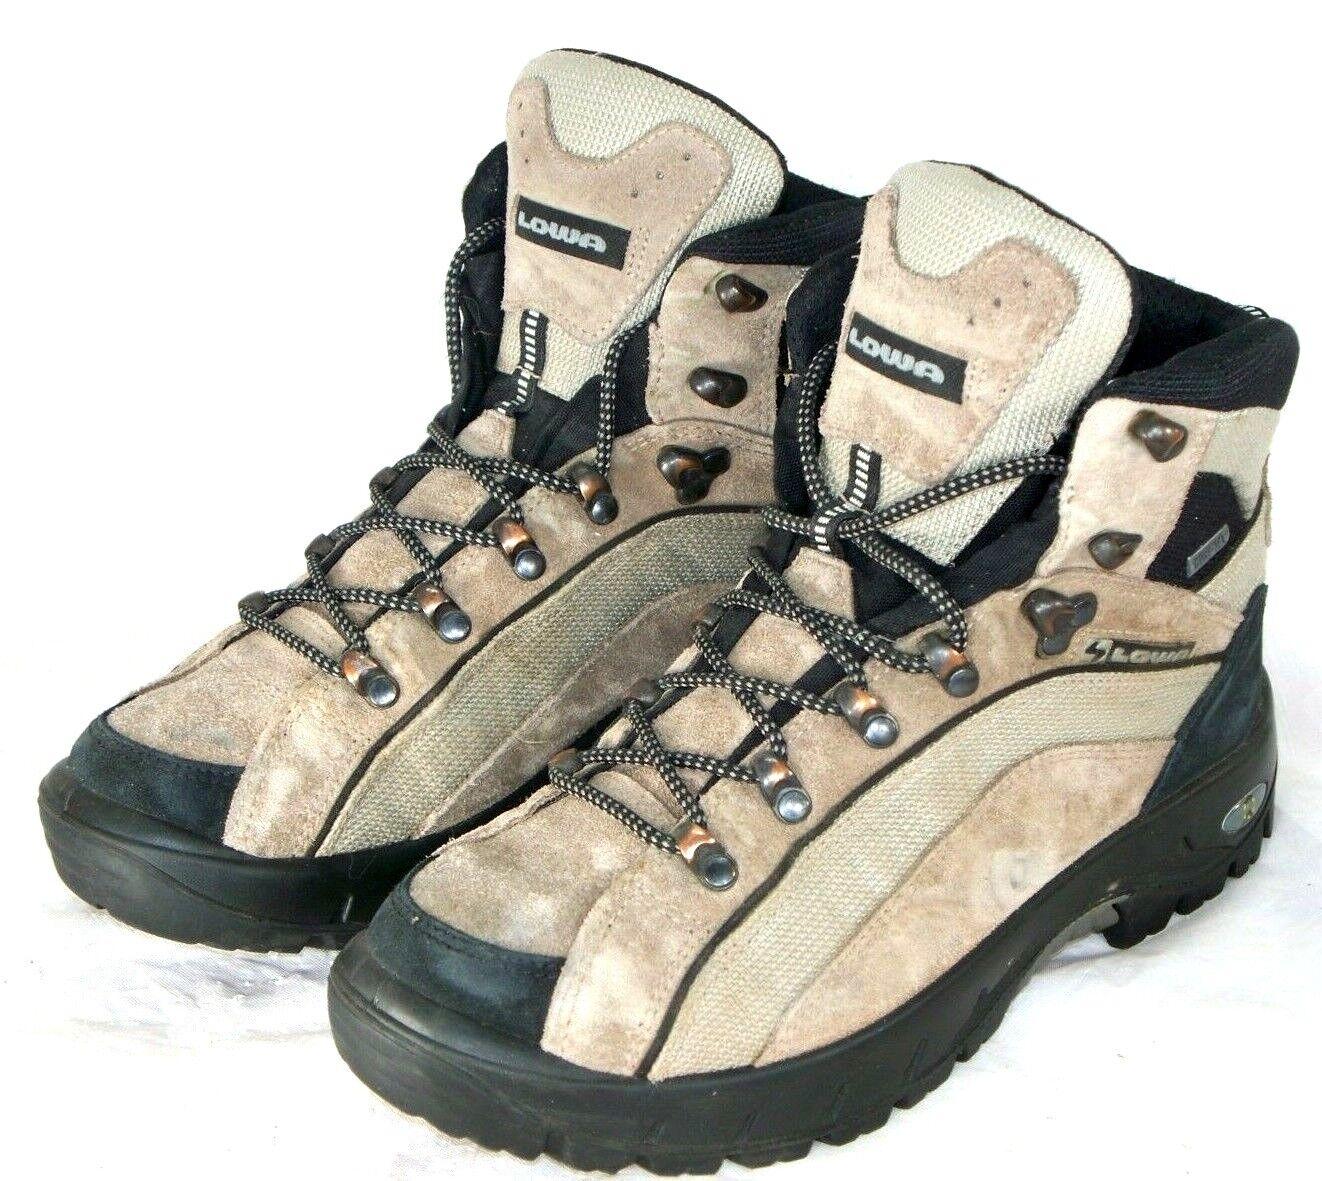 Lowa Klondike GTX Mid Lady Gore Tex Hiking Boots Size 7 Hike Trail Mountain